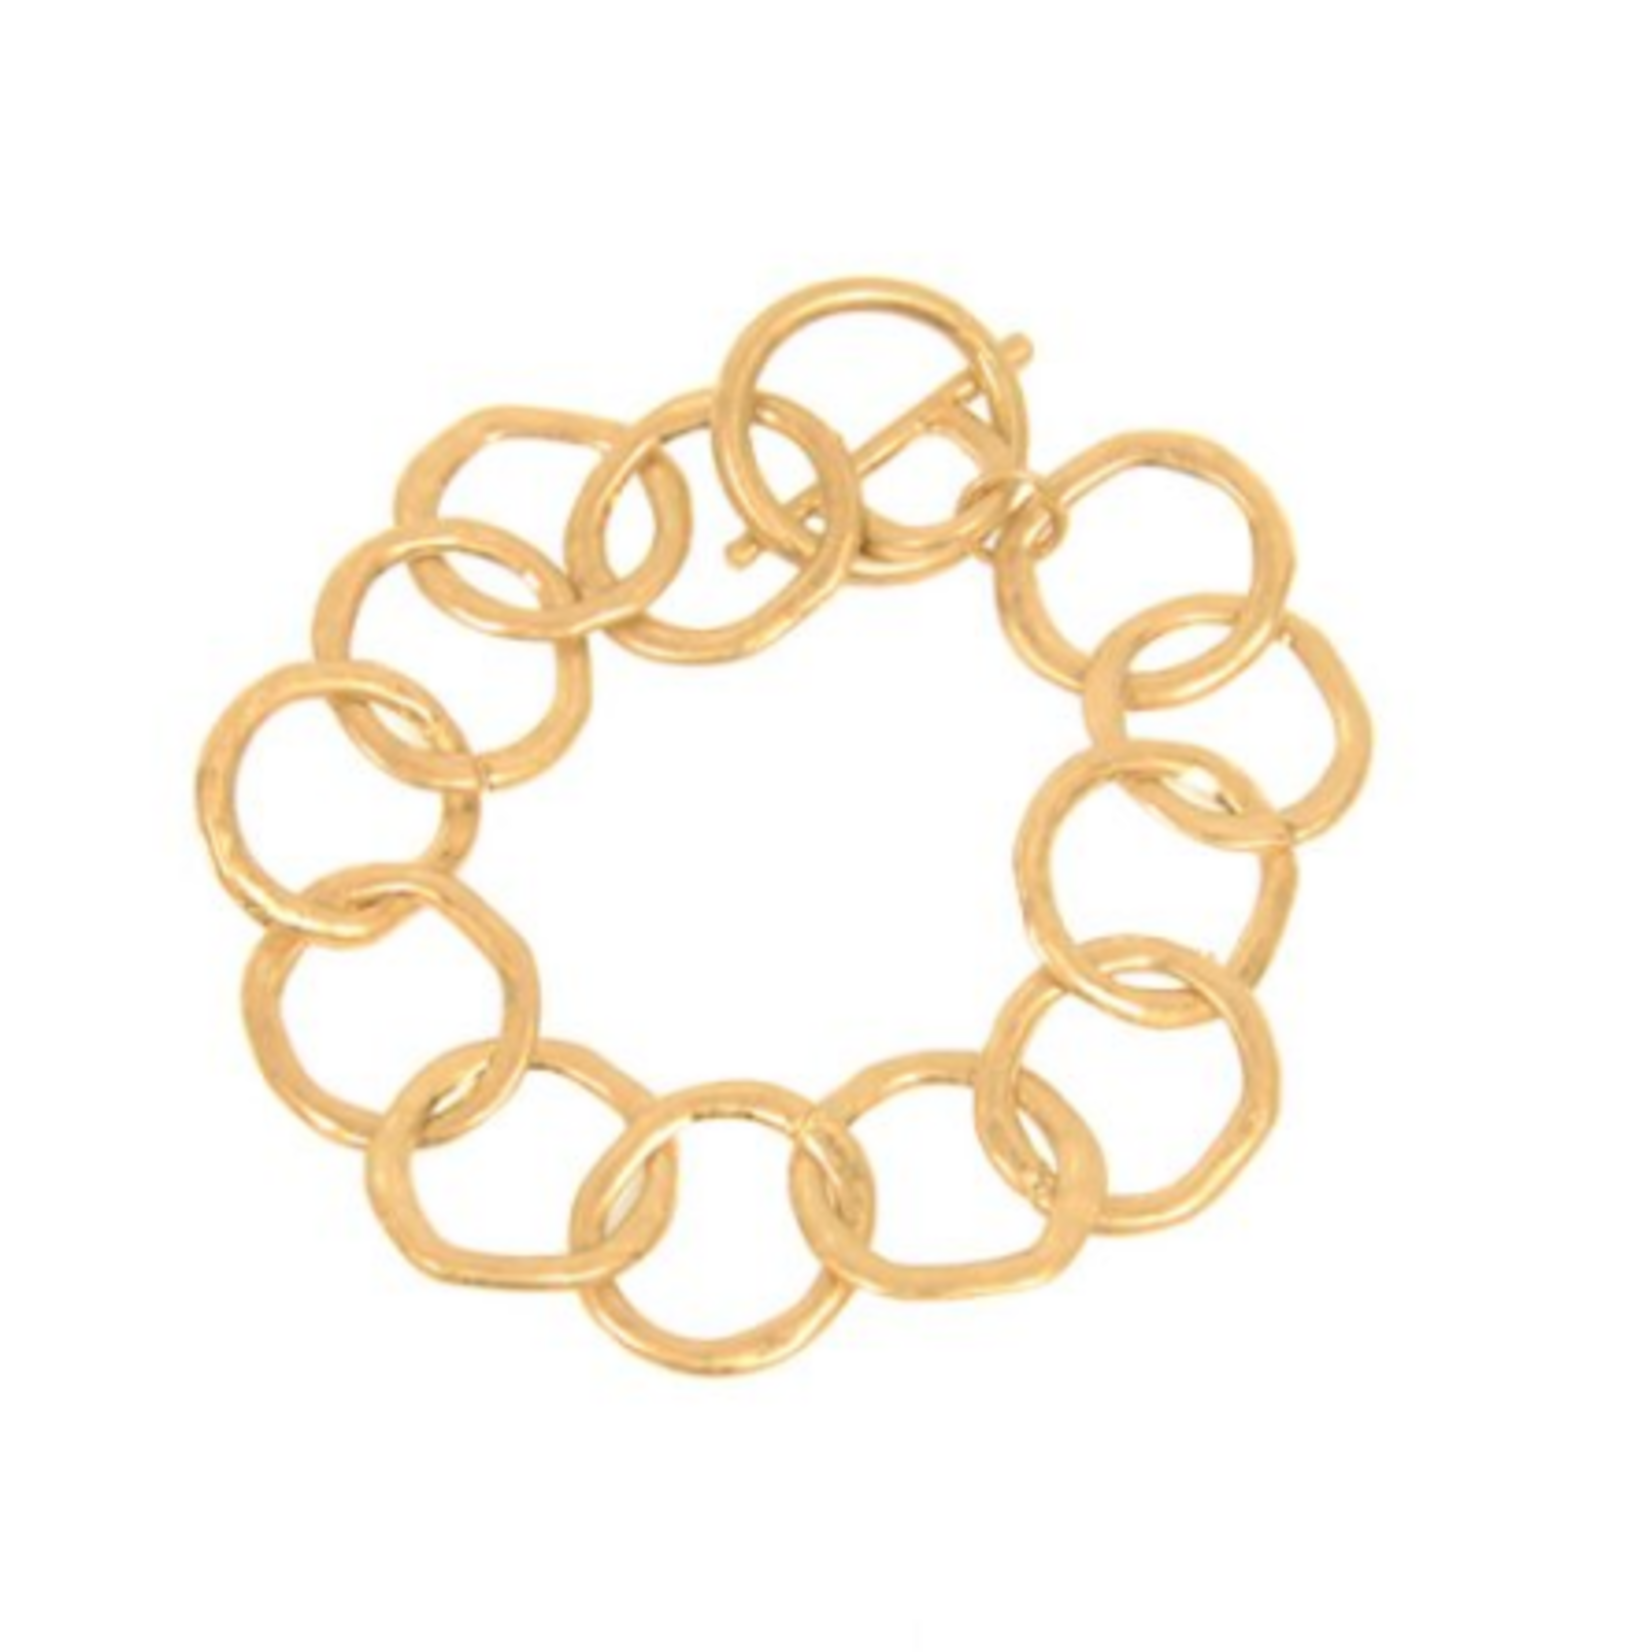 Joy Susan Joy Susan Link Toggle Bracelet